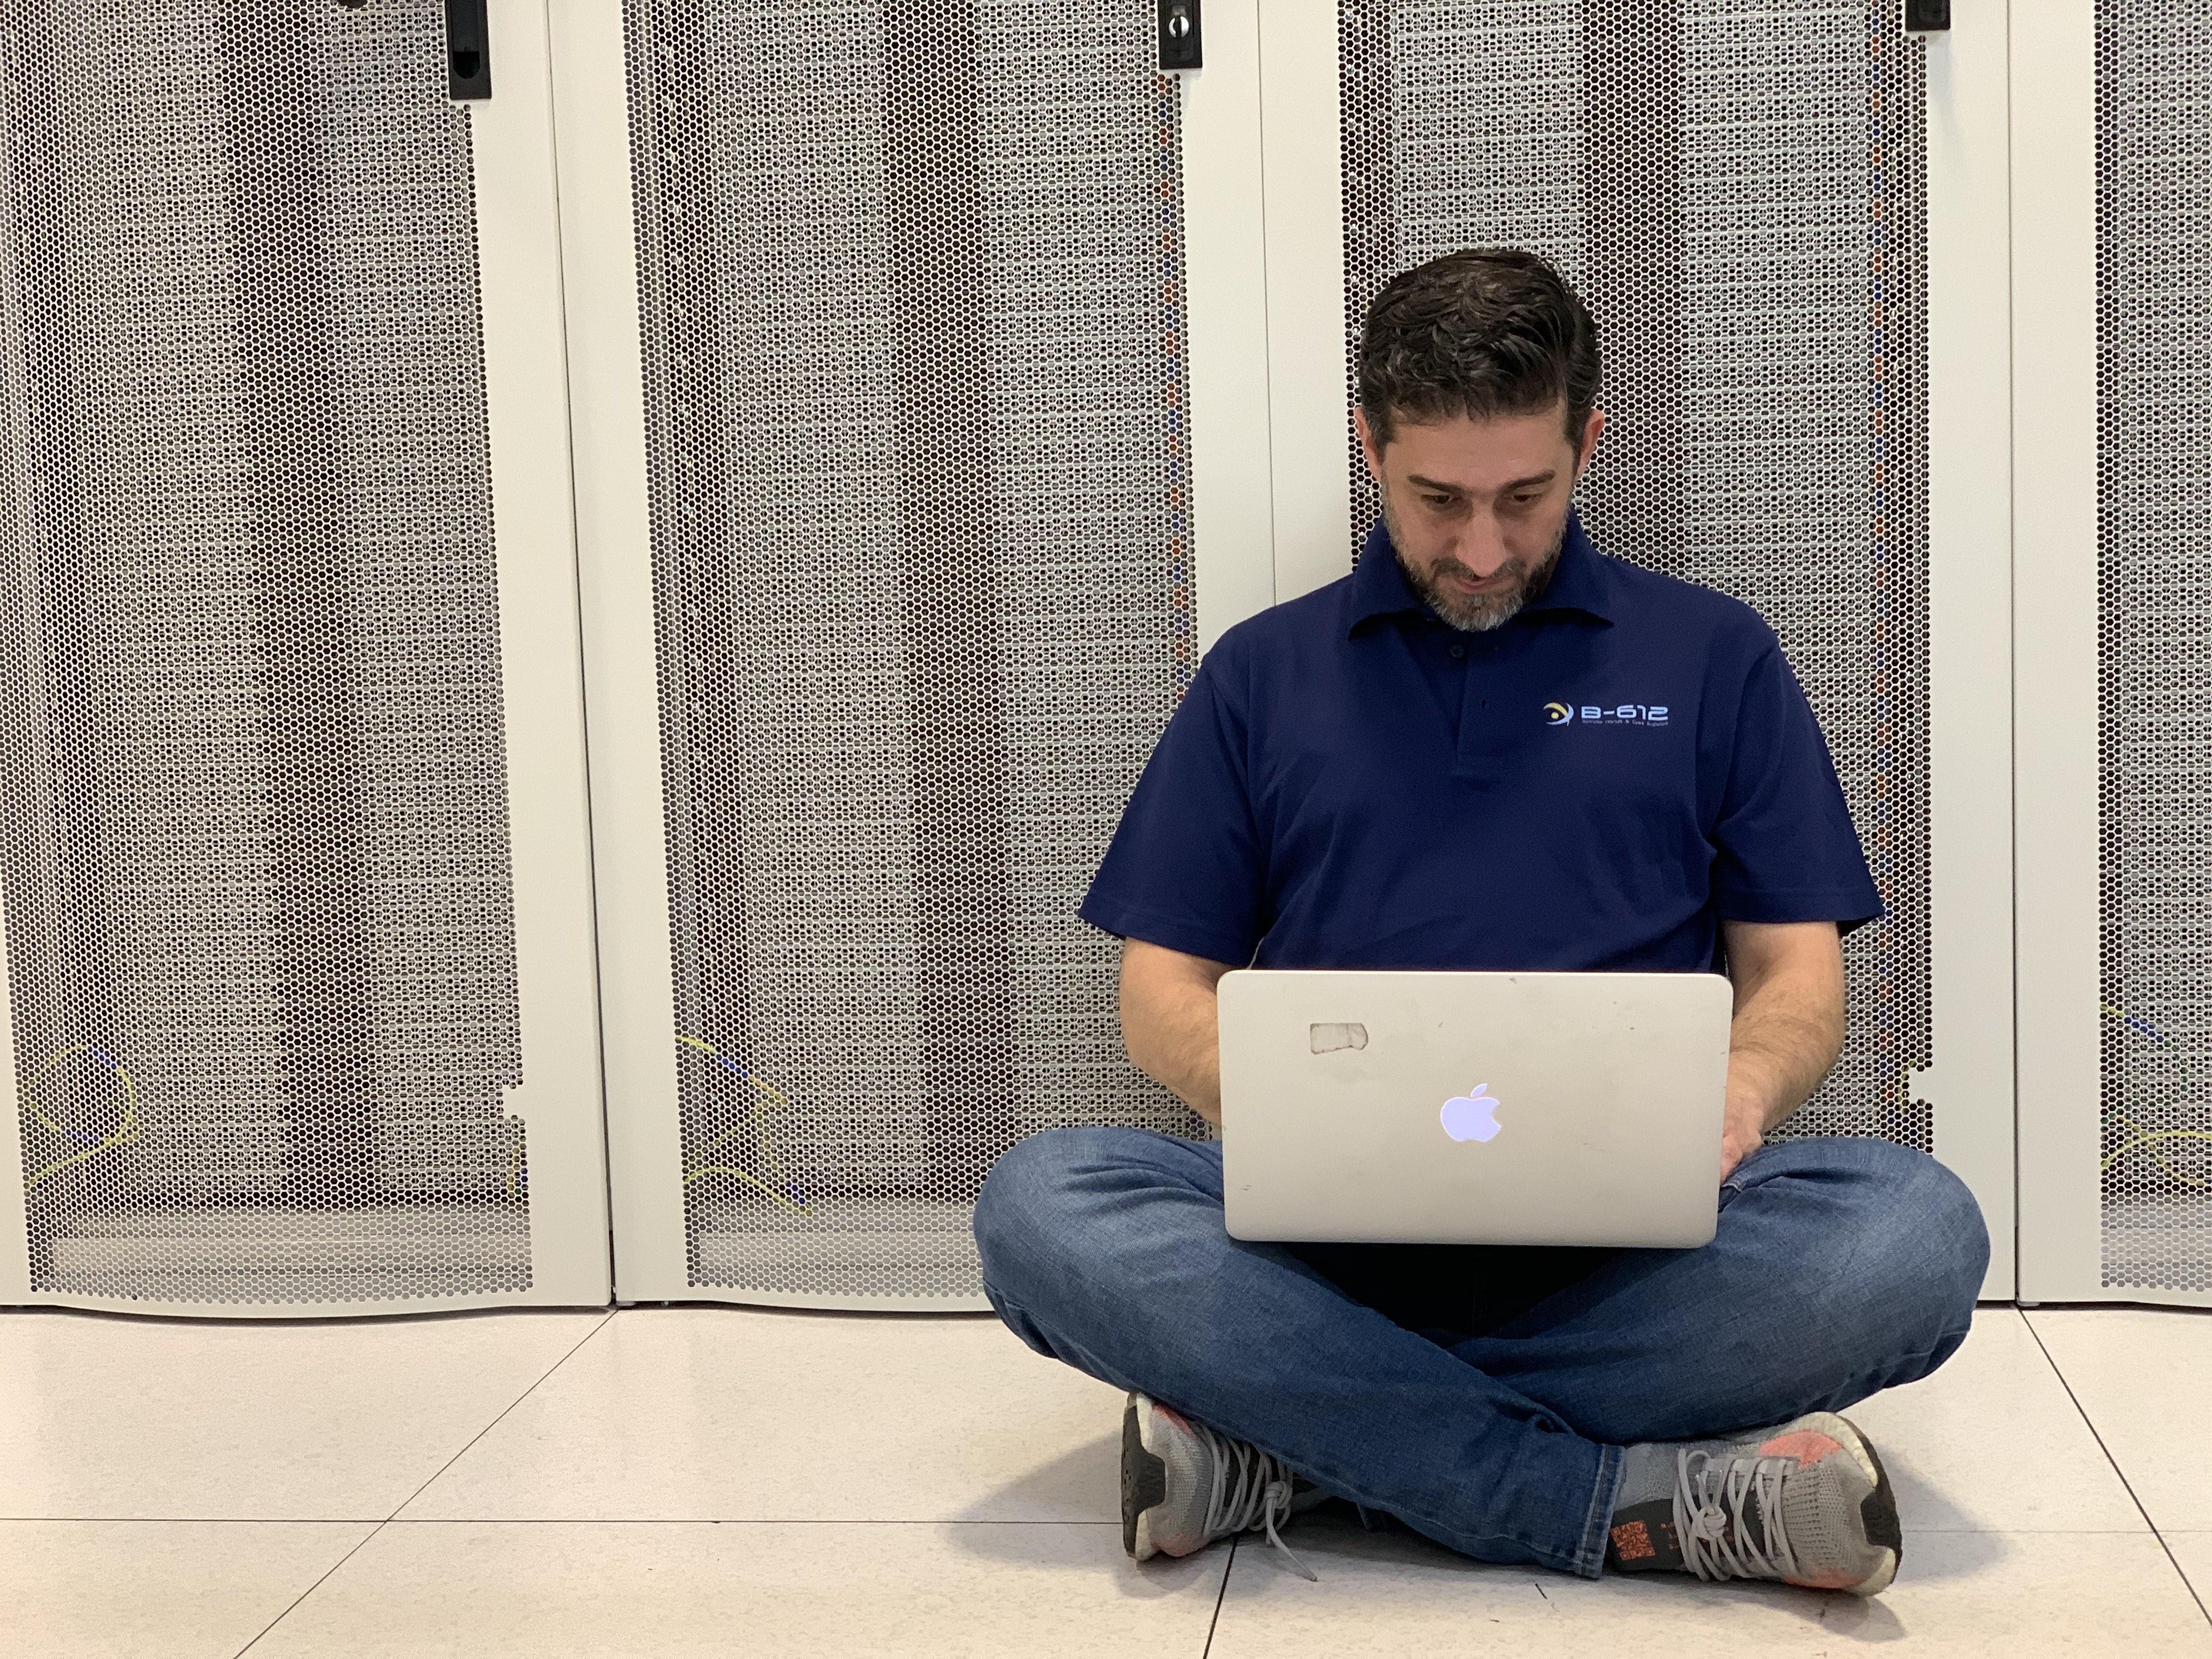 Sabah at work with laptop